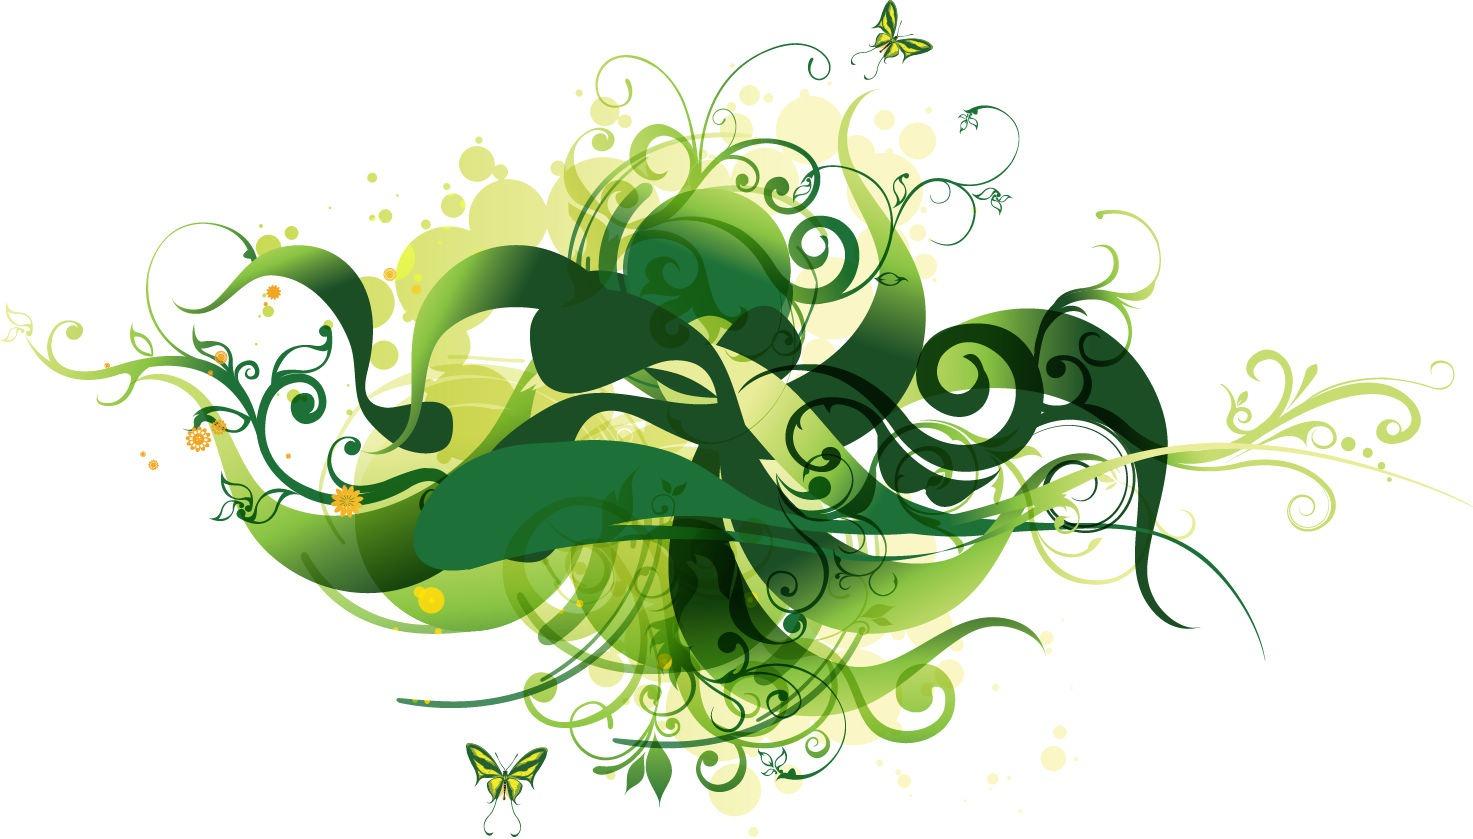 Green Flower Line Drawing : Green line designs images curved design art